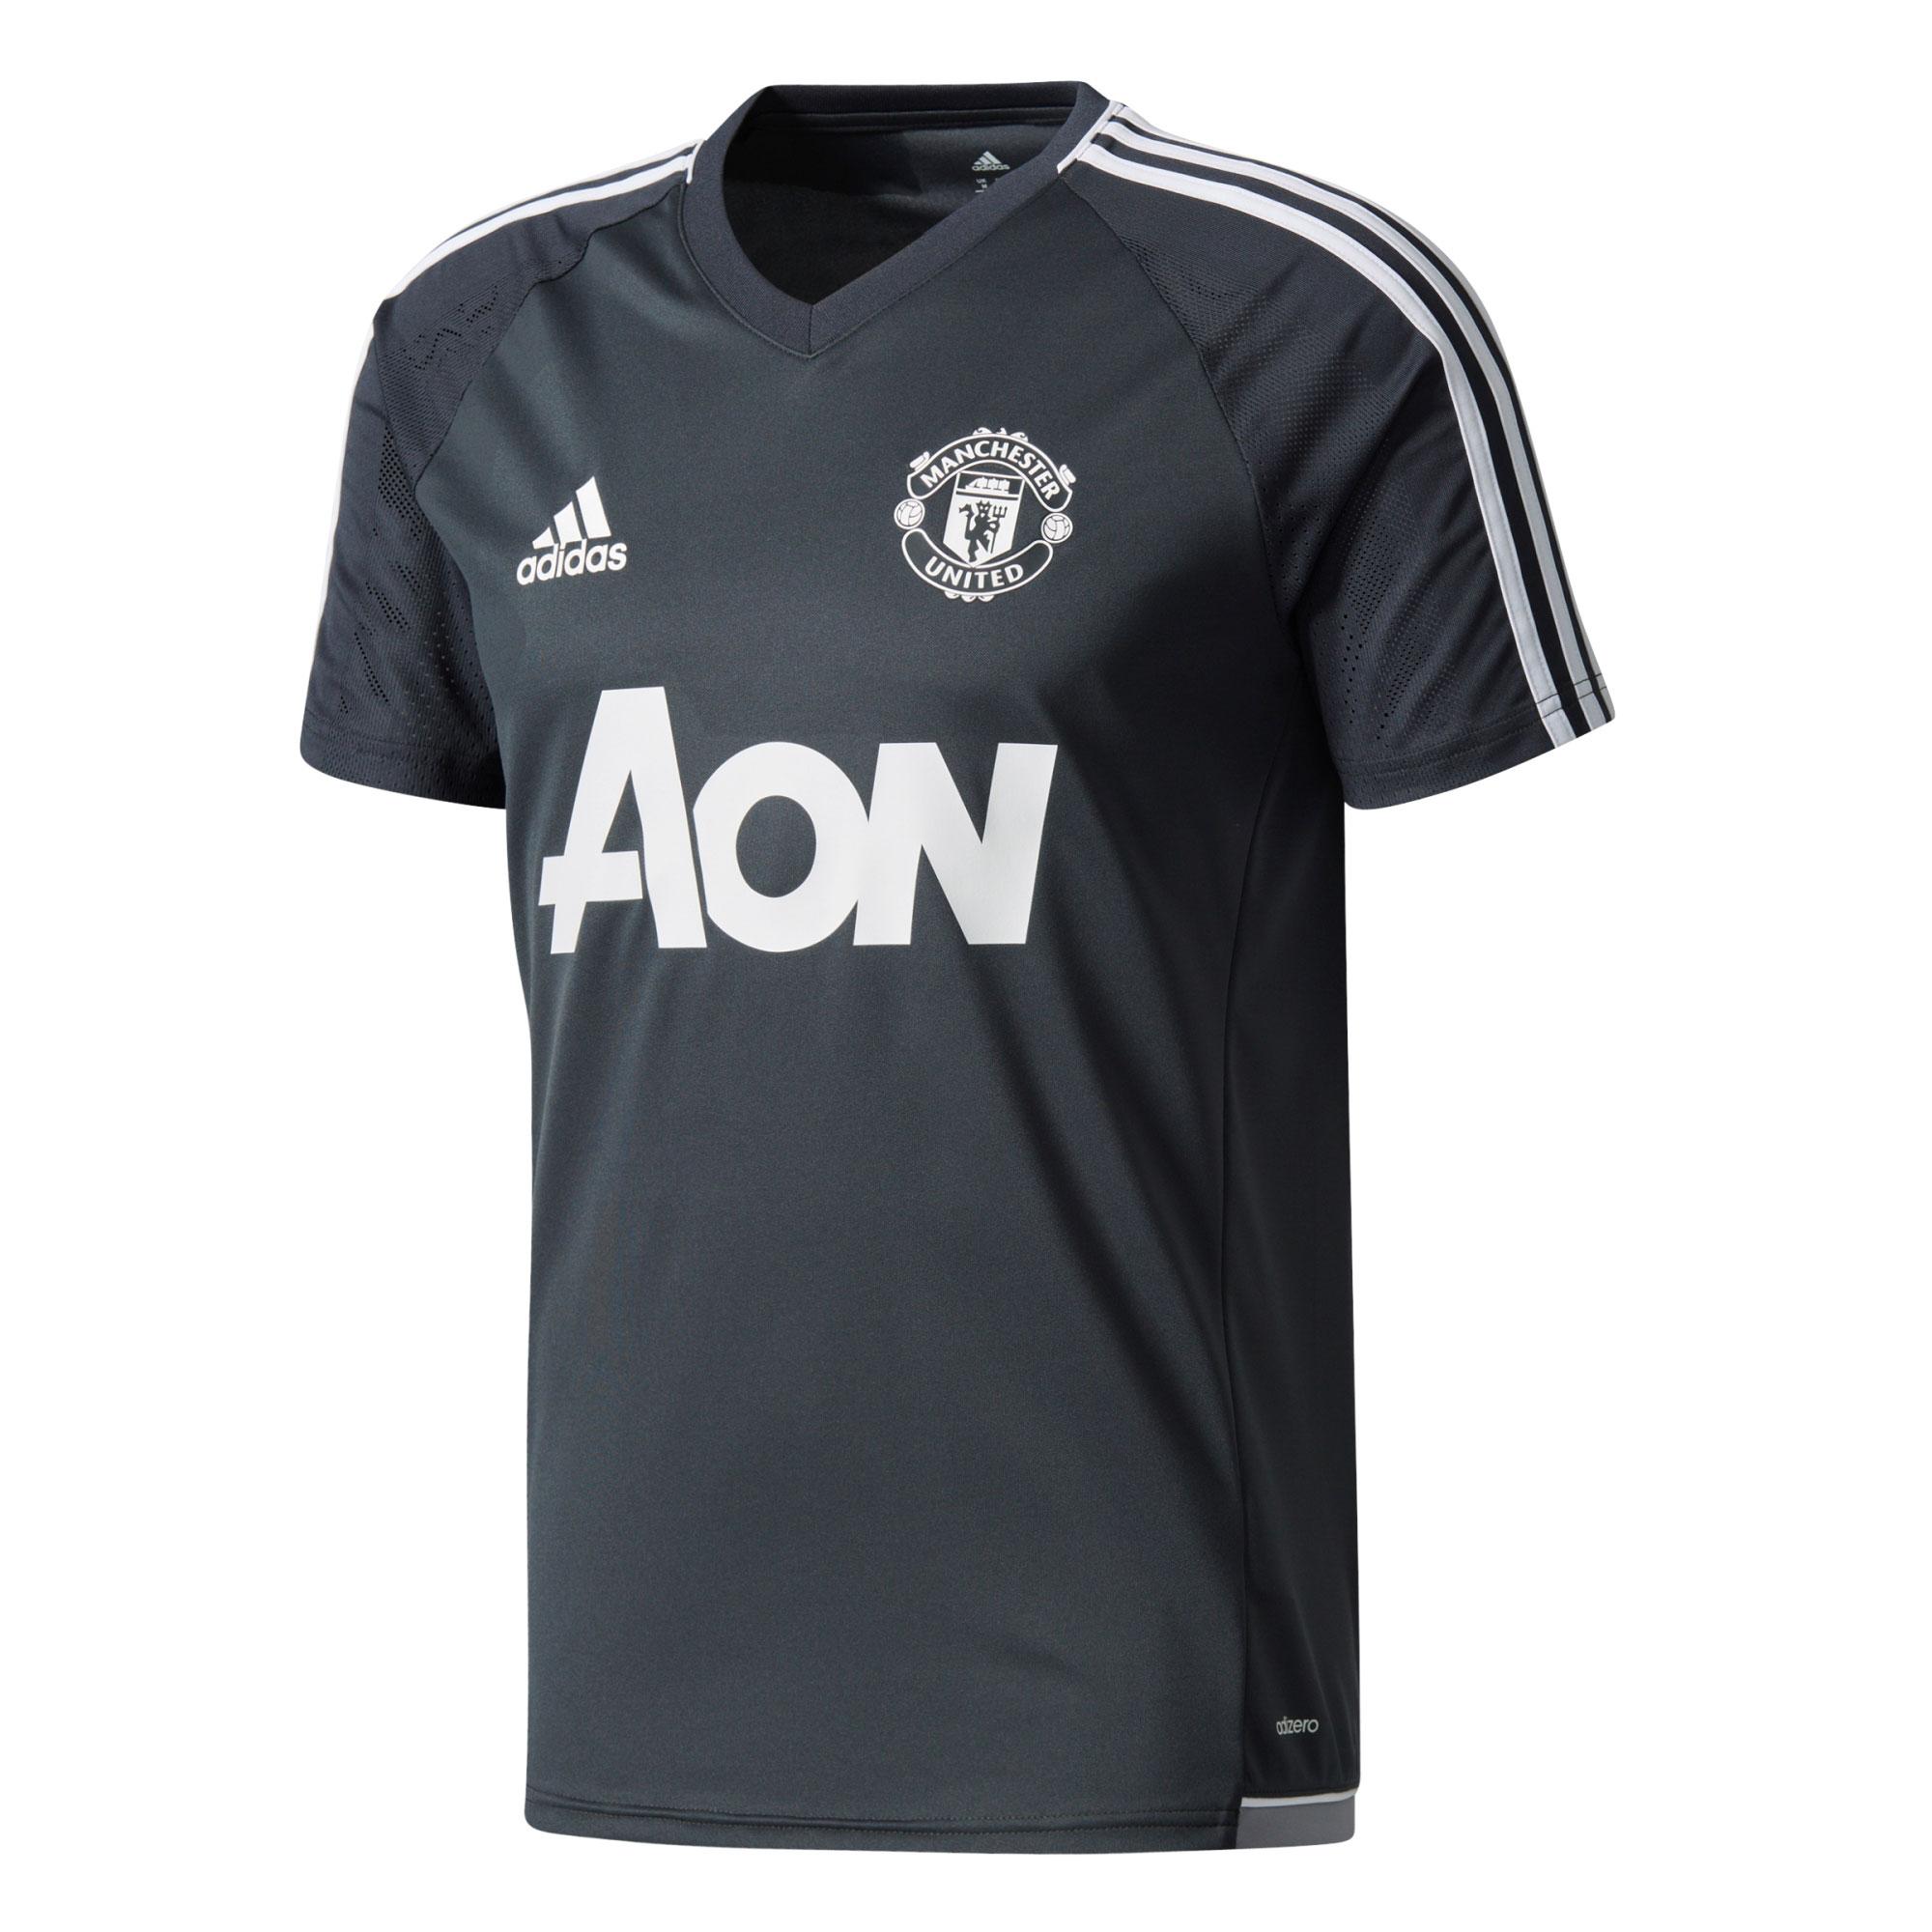 Manchester United Training Jersey - Dark Grey